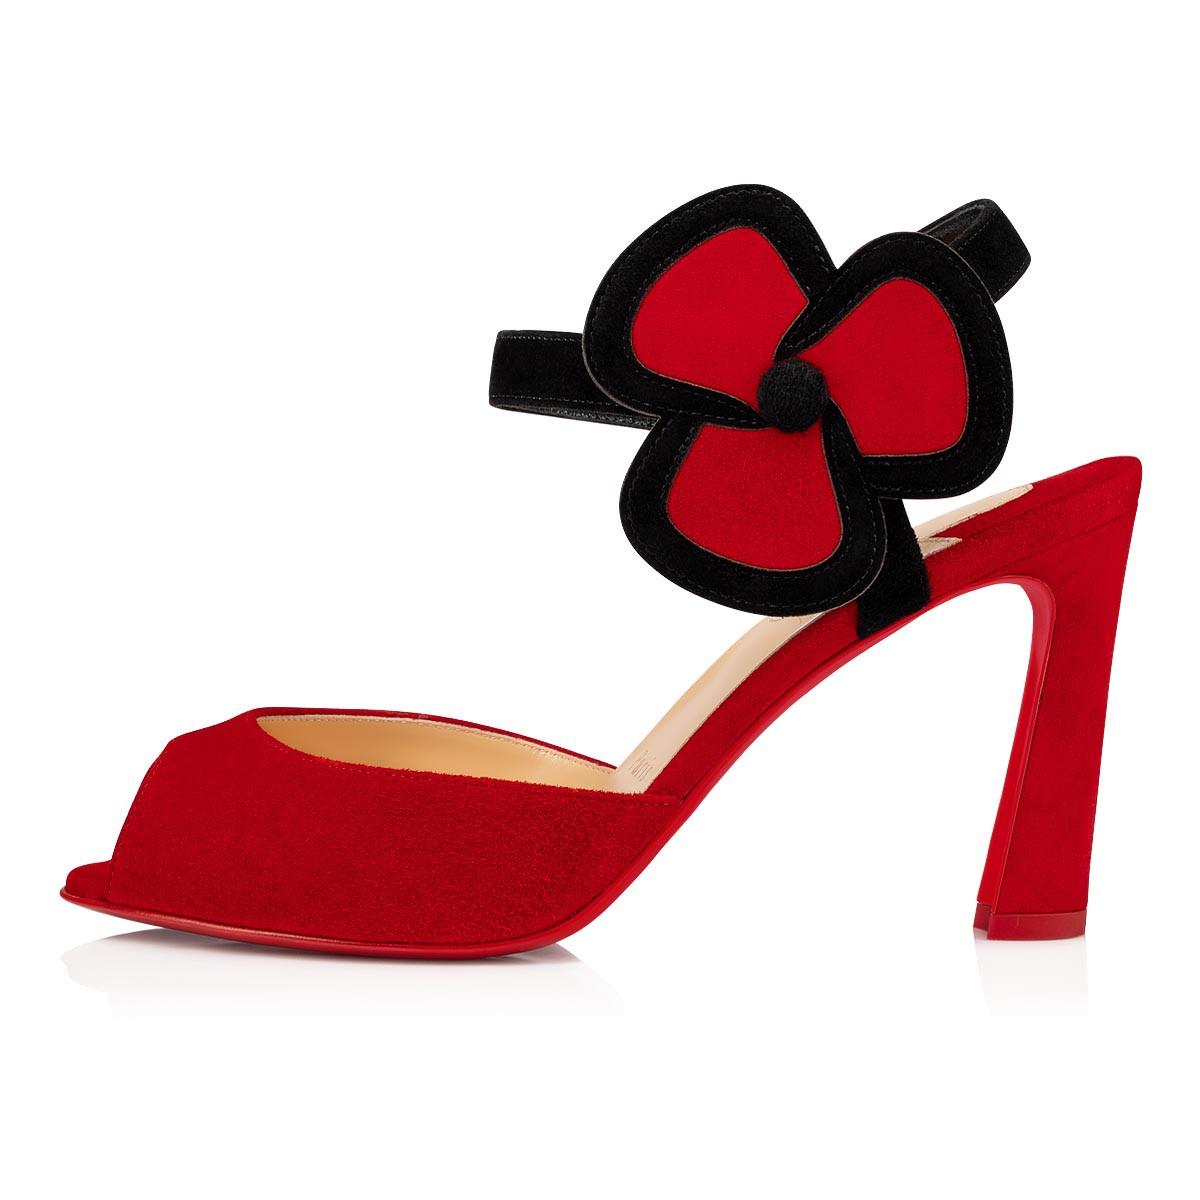 Shoes - Pansy - Christian Louboutin